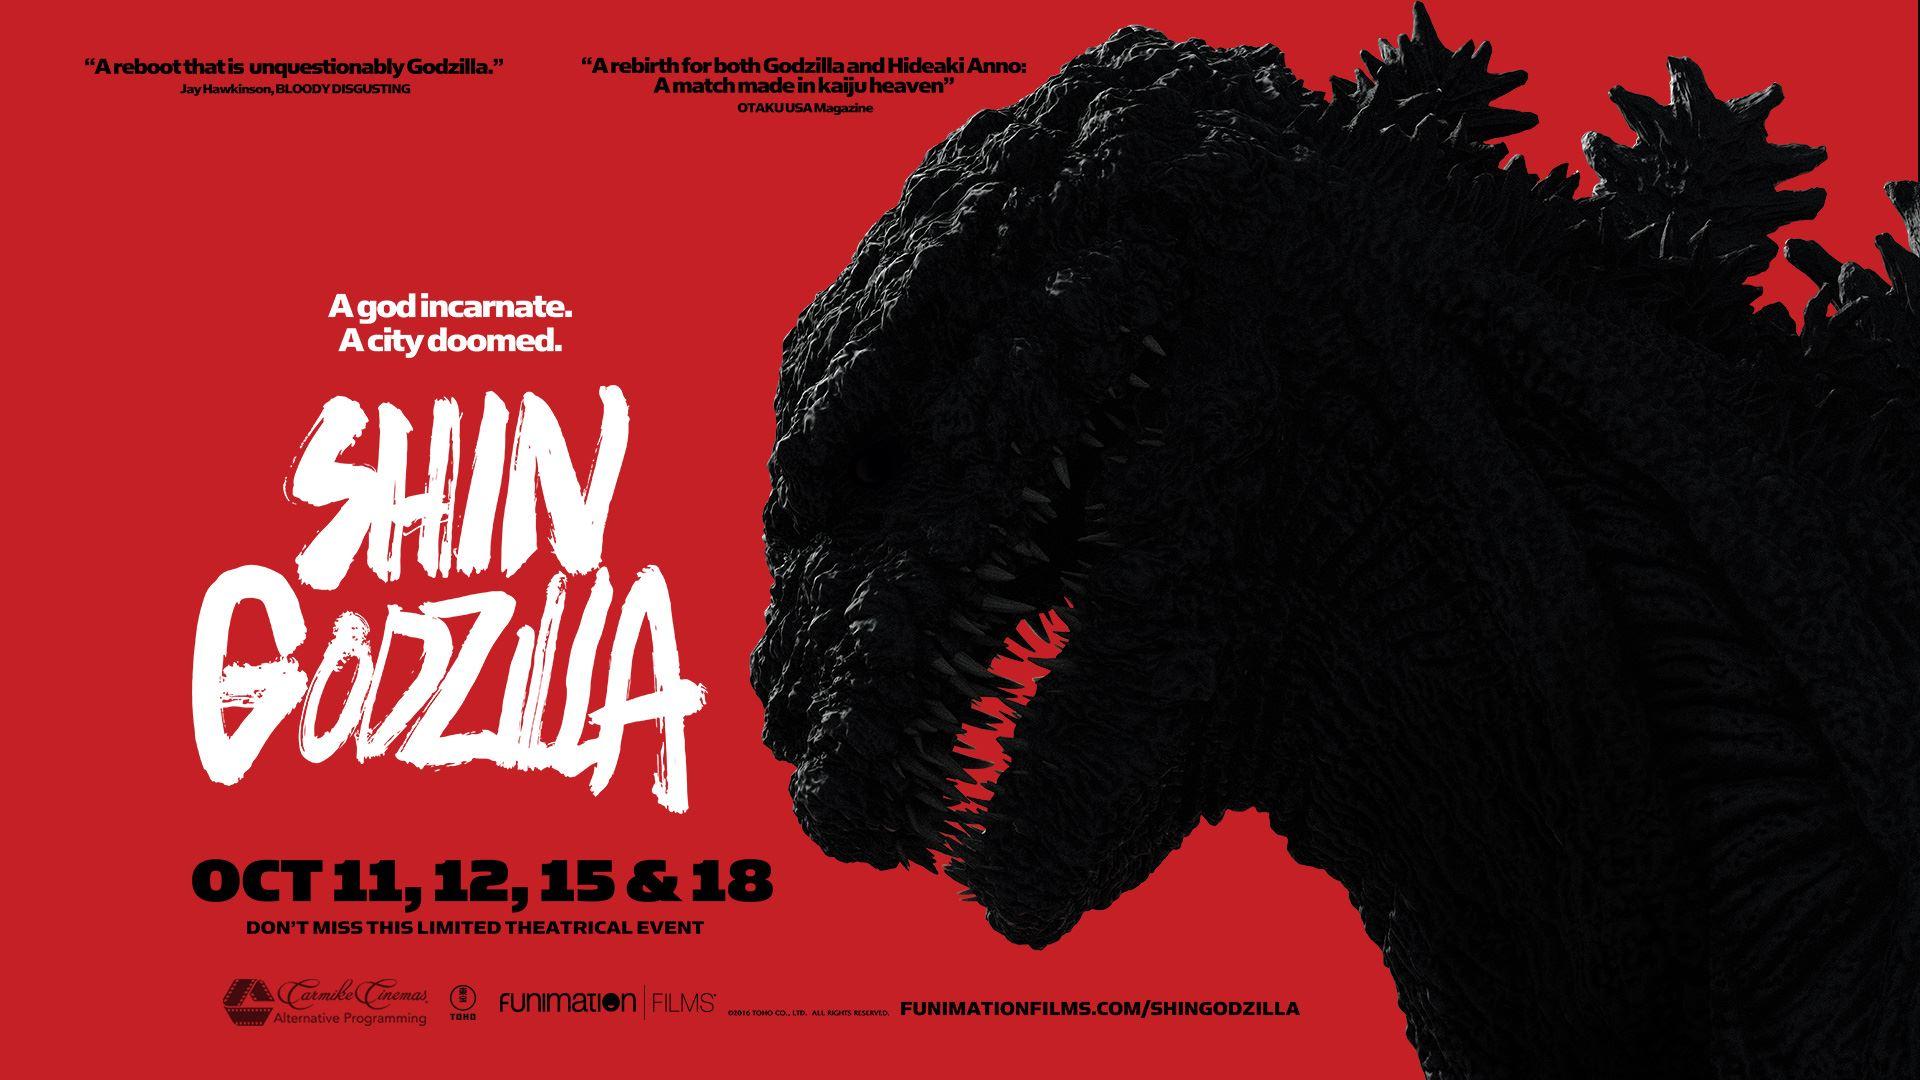 Shin Godzilla (image from https://www.carmike.com)